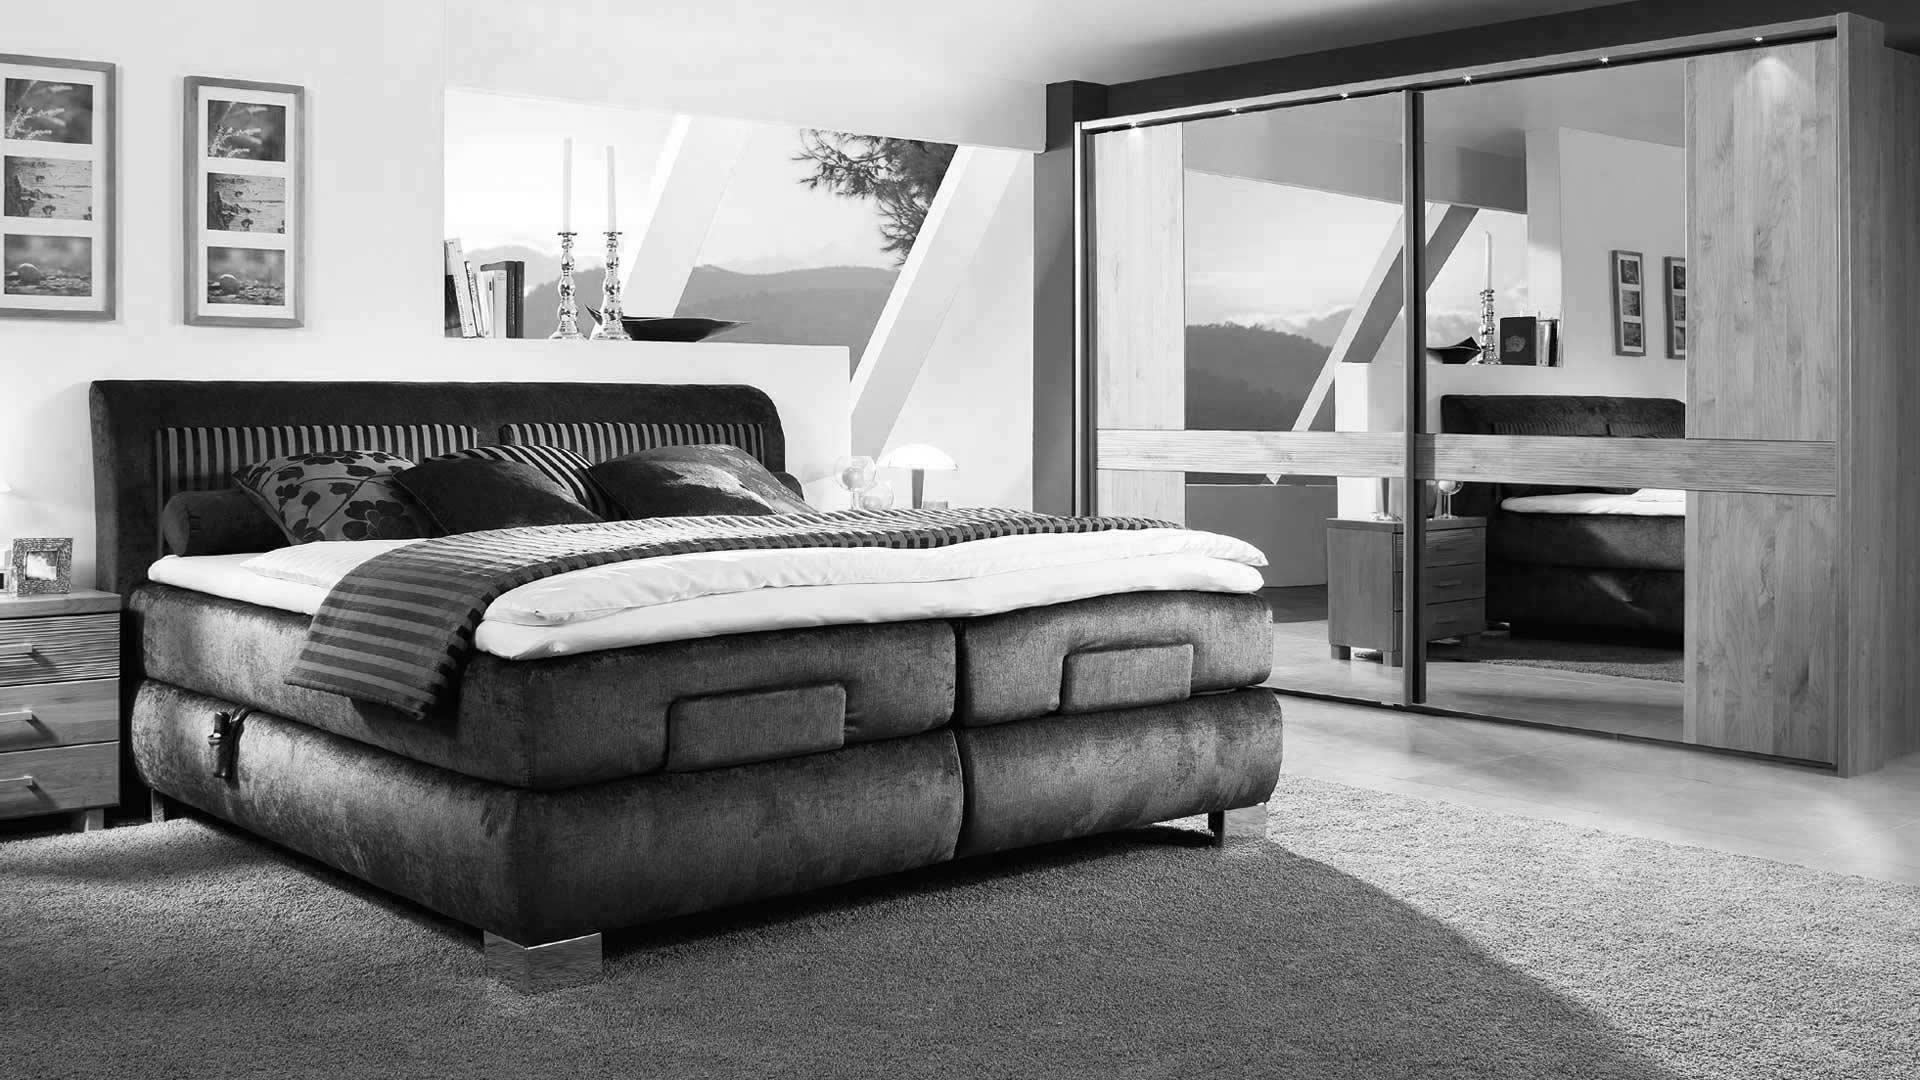 Möbelhäuser Kassel schlafzimmer europa möbel vellmar nahe kassel möbel bolte